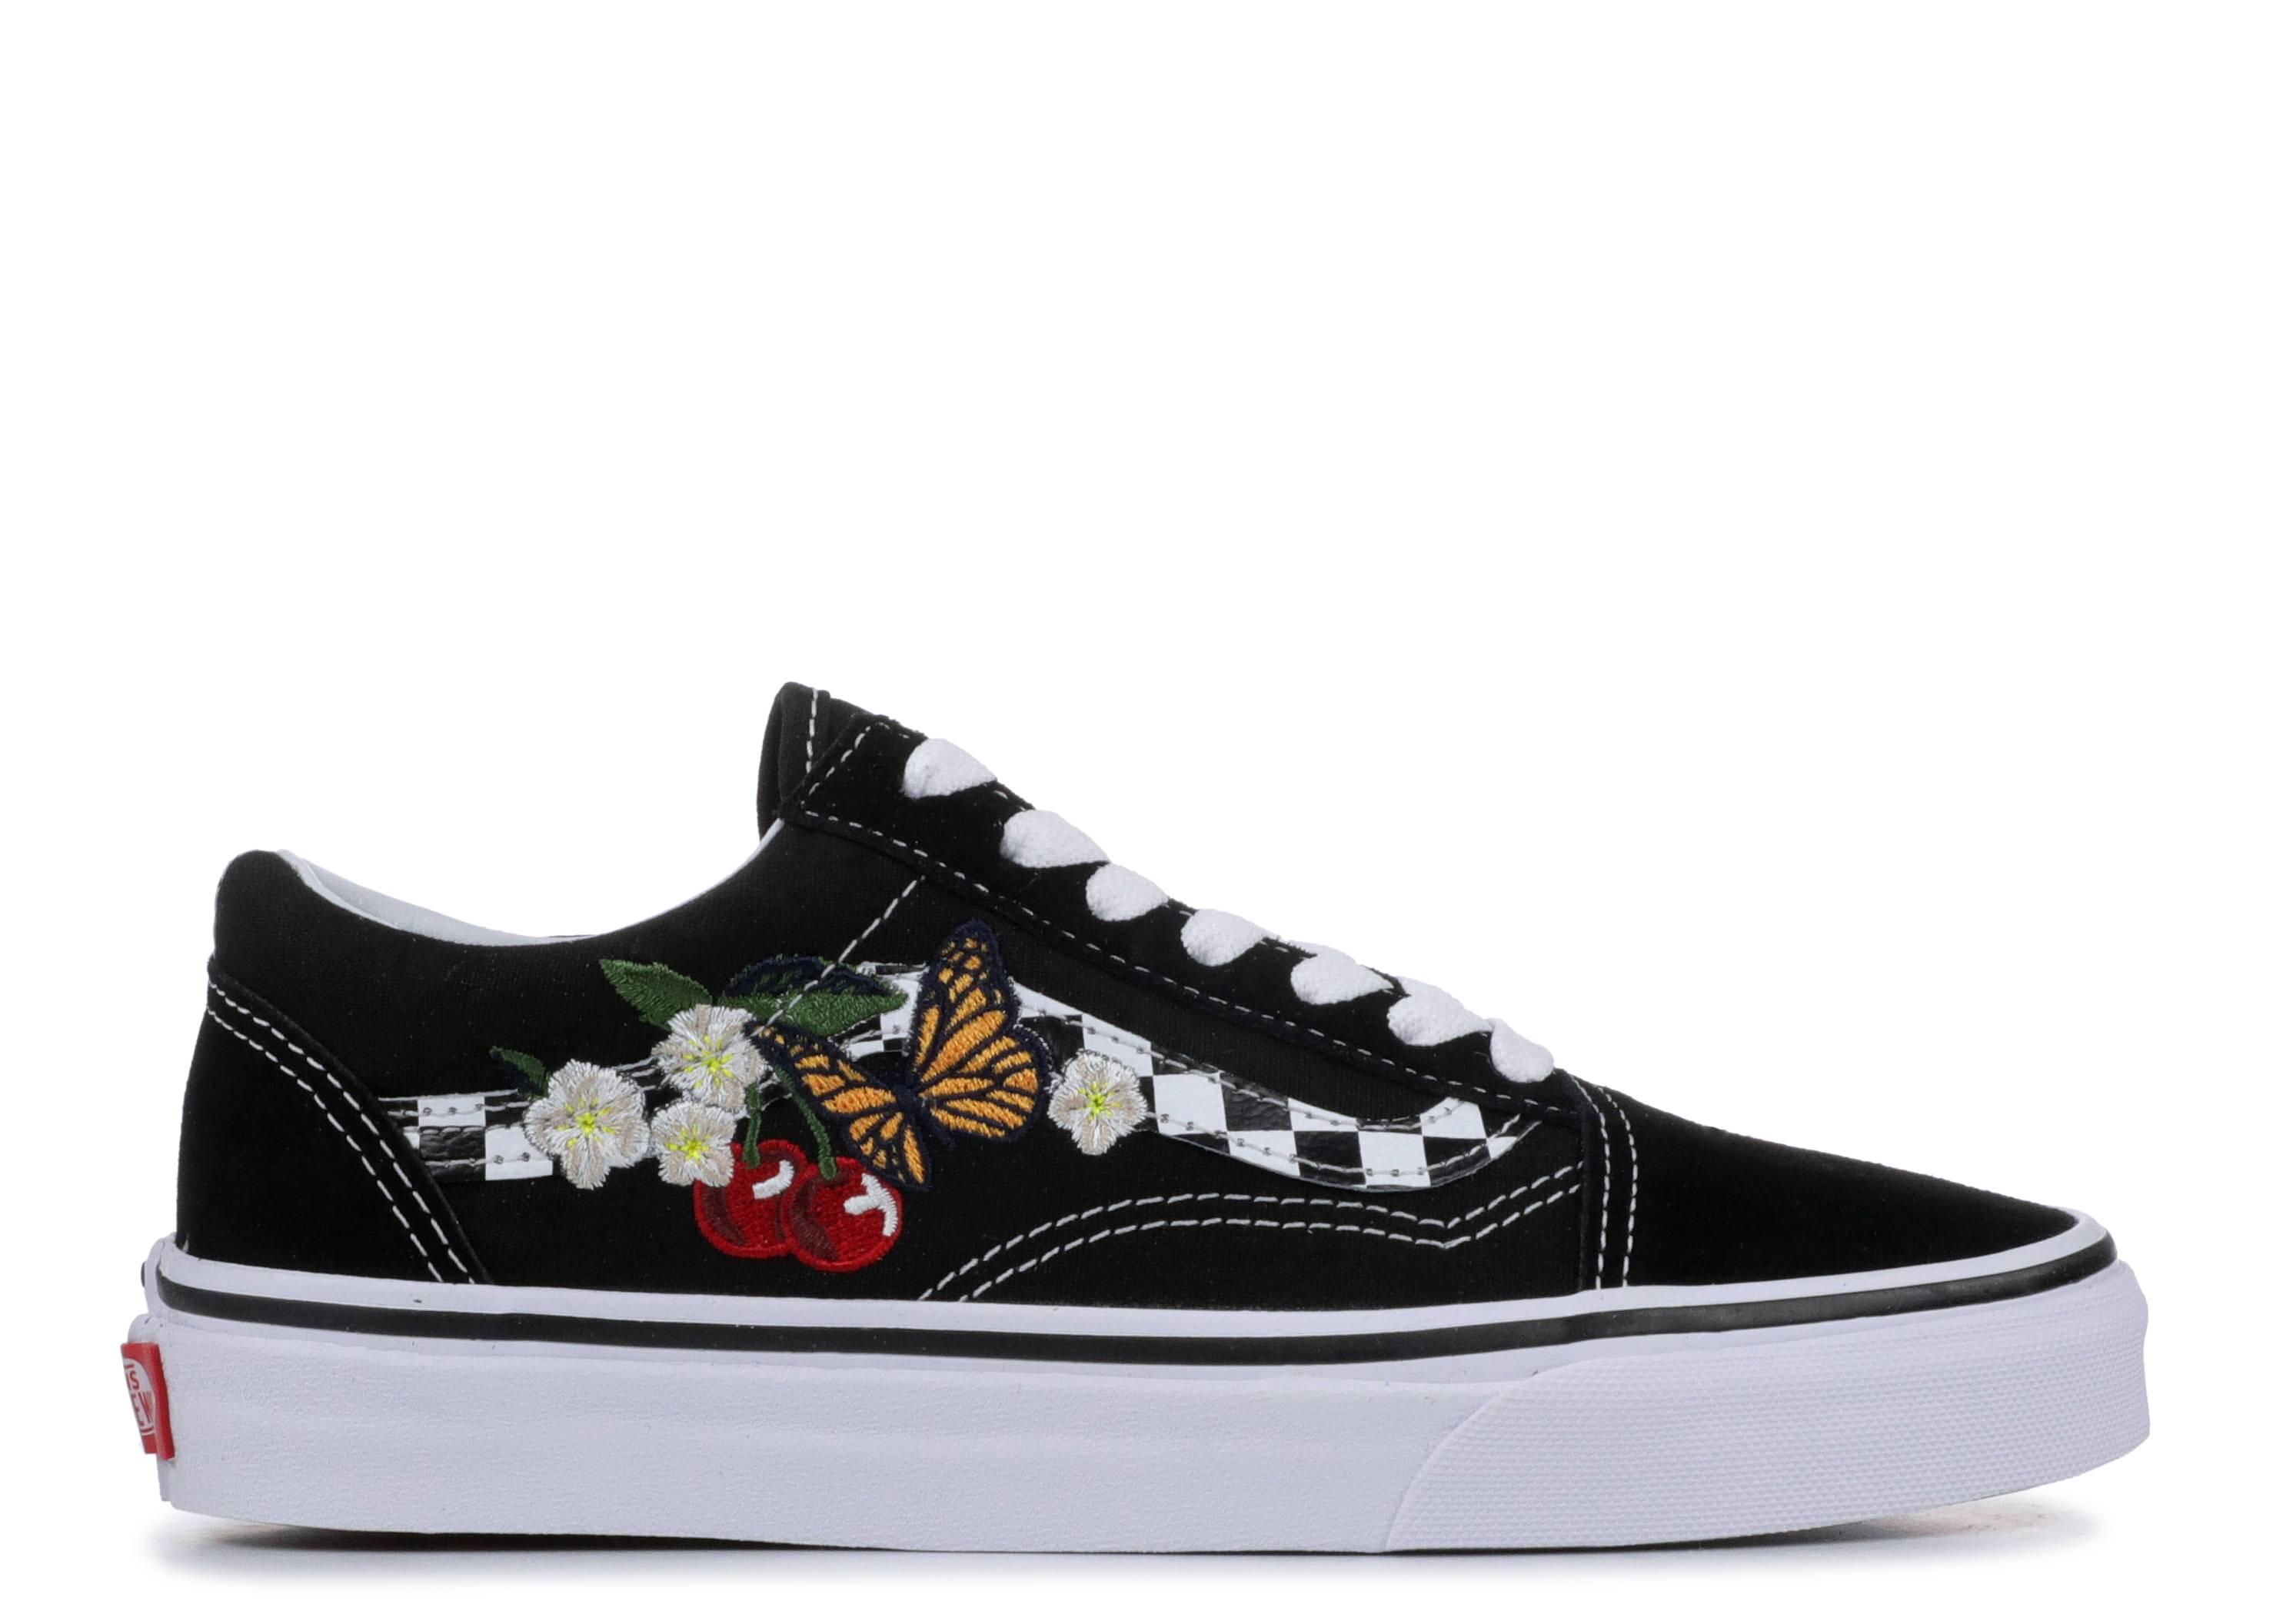 1e999edc41edef Old Skool - Vans - vn0a38g1i5z - (checker floral) black